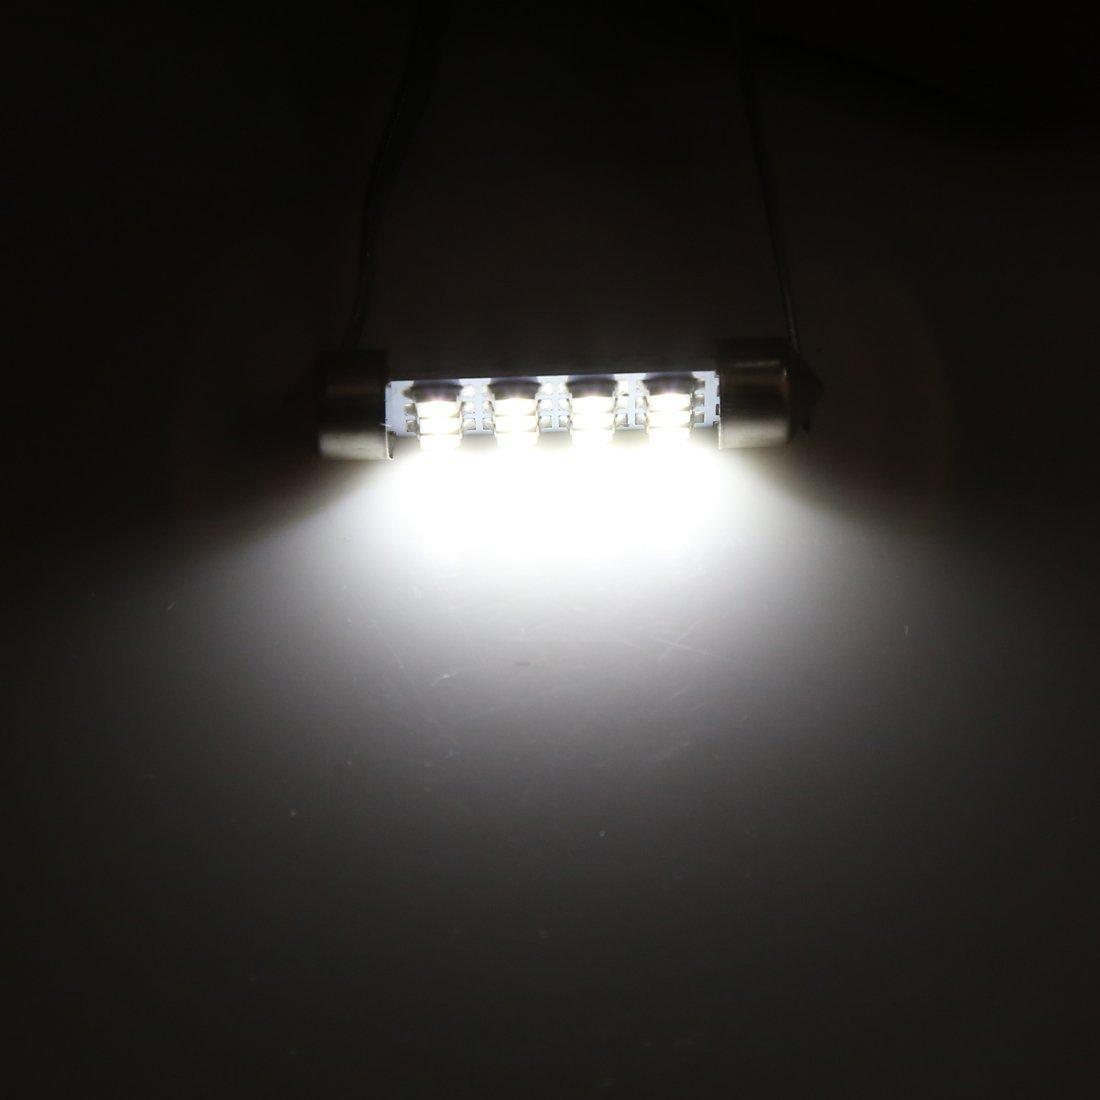 Amazon.com: eDealMax 30pcs coche Blanco bombilla LED 41mm Festoon 12 SMD 1210 Dome Mapa Interior de luz de lámpara: Automotive